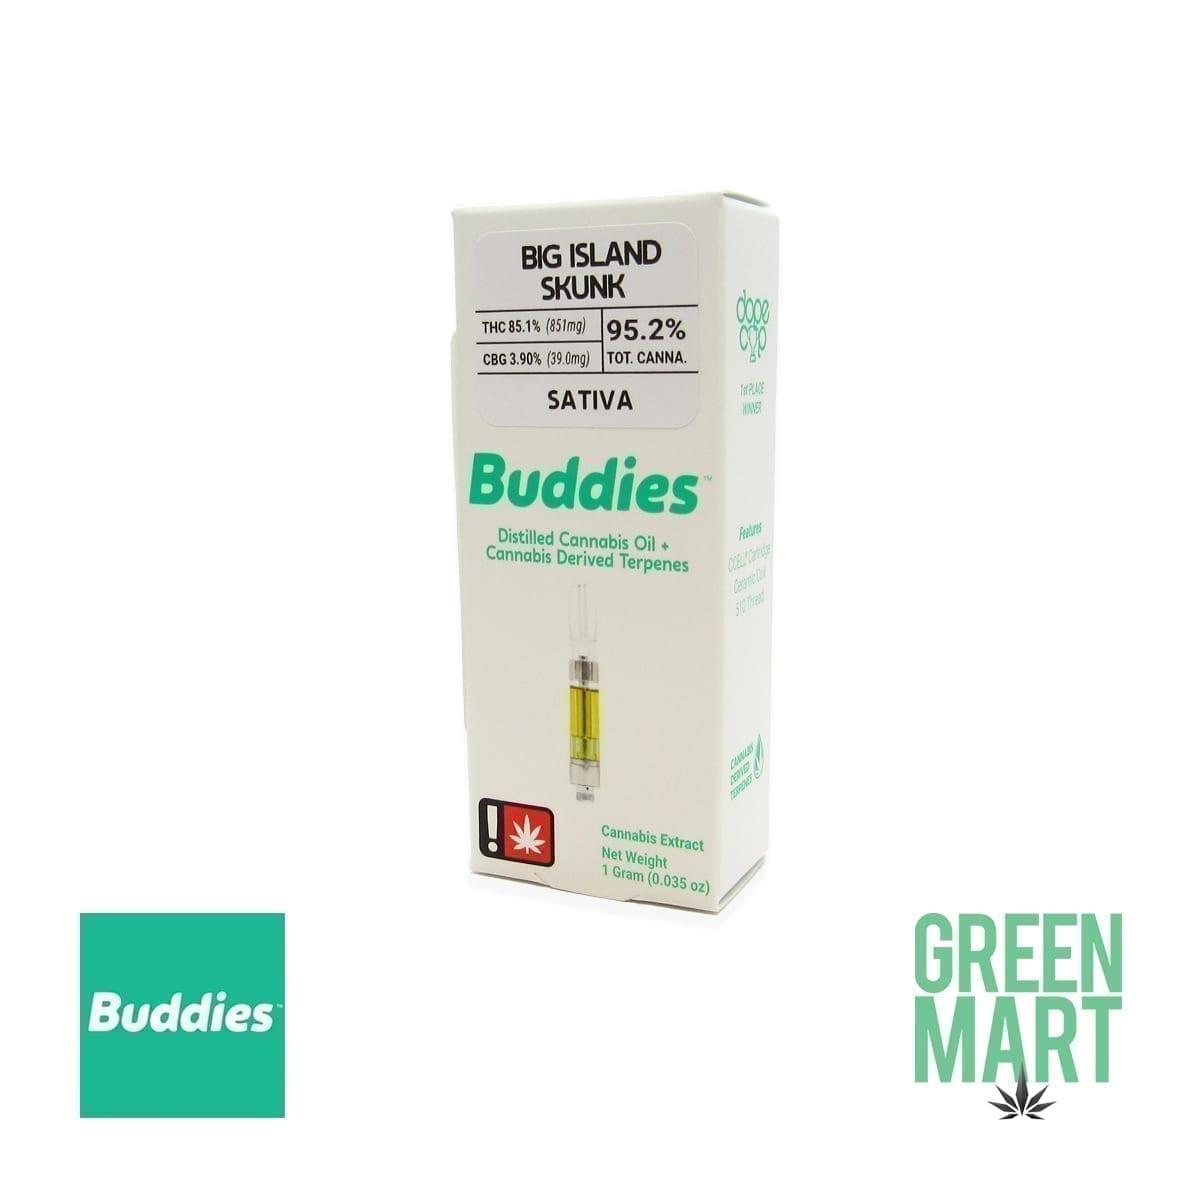 Buddies Brand Distillate Cartridge - Big Island Skunk